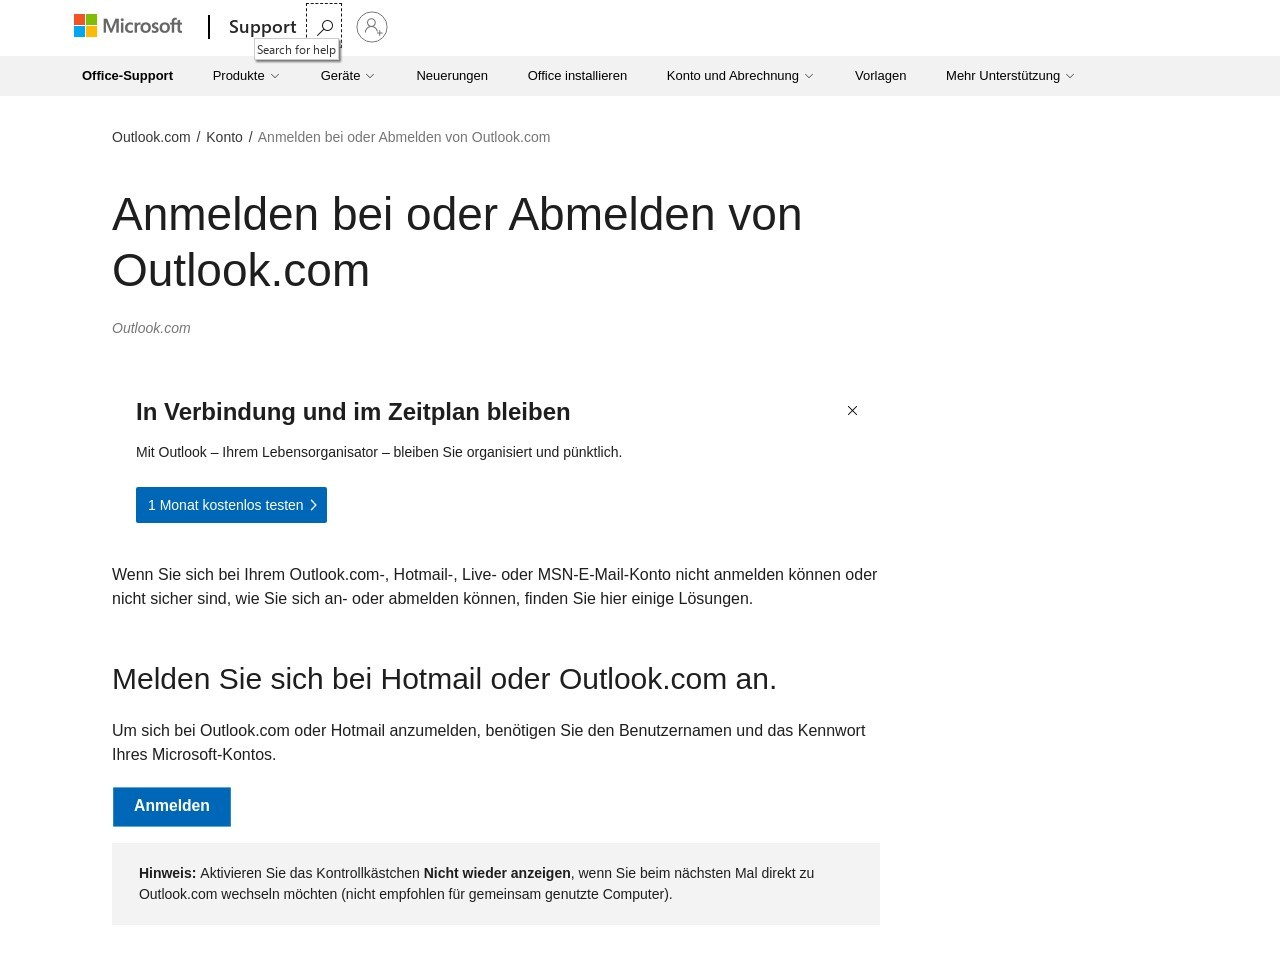 Anmelden bei oder Abmelden von Outlook.com - Outlook